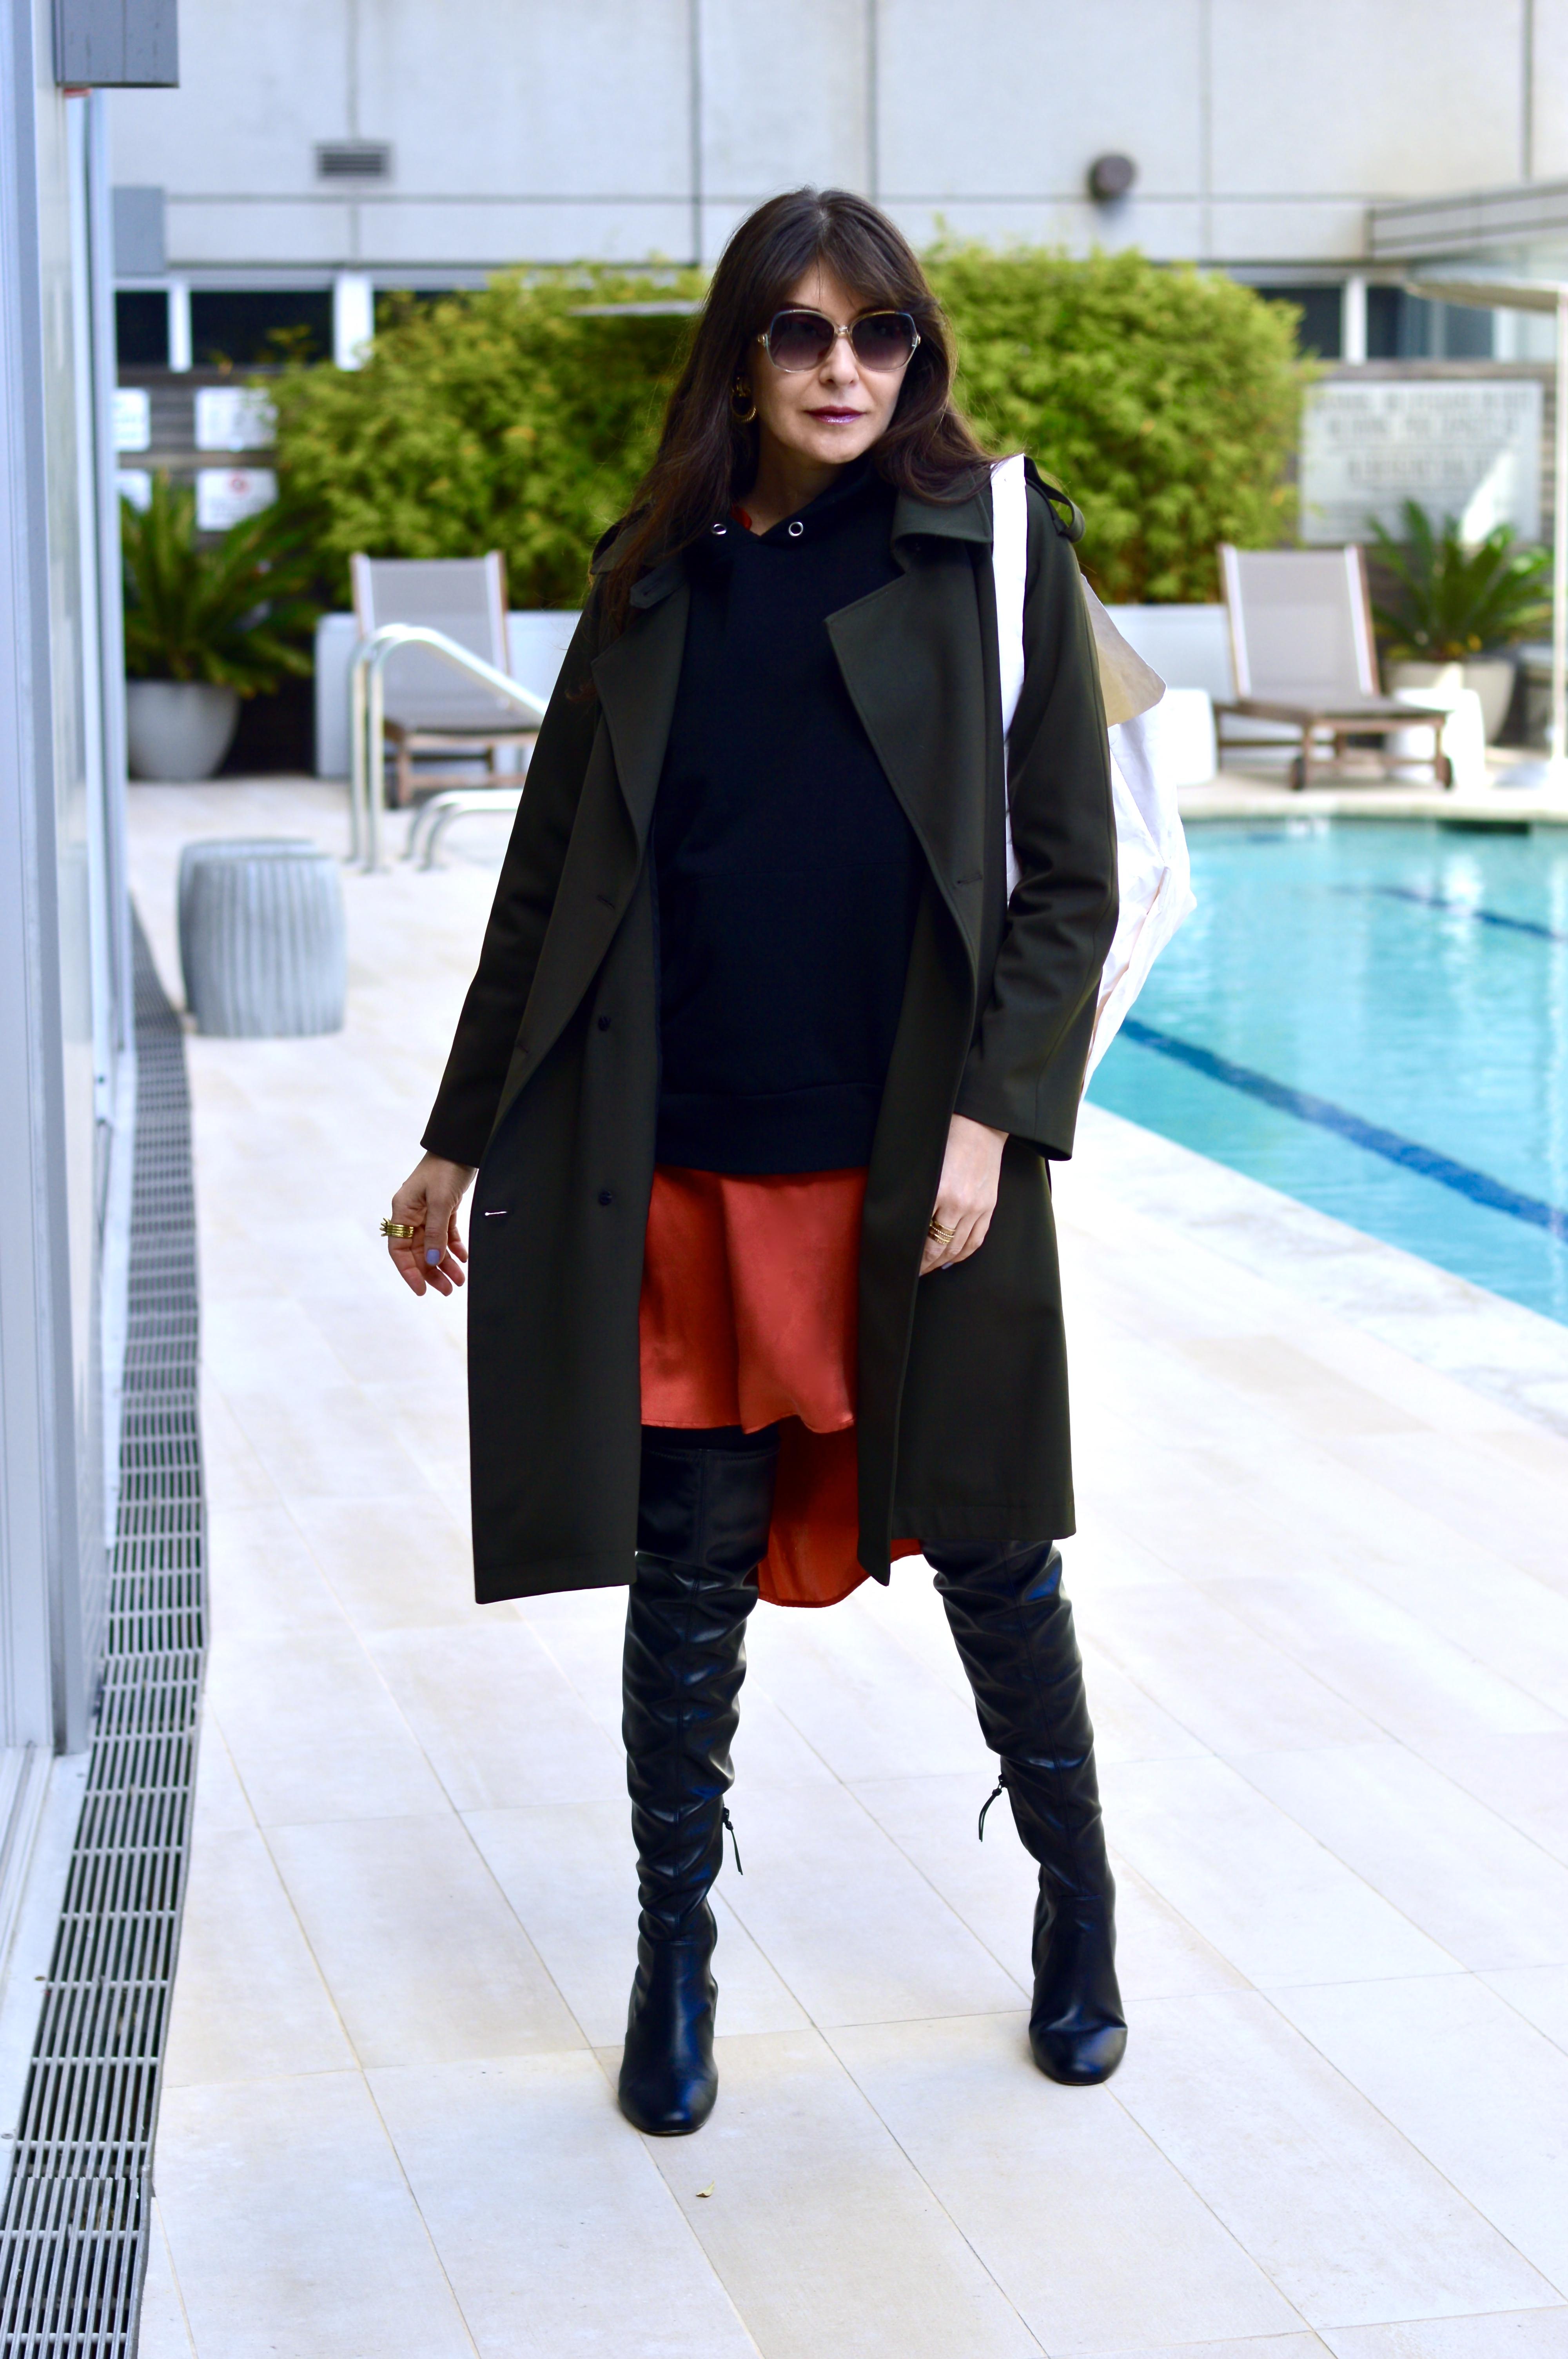 Silk dress + hoodie + trench coat